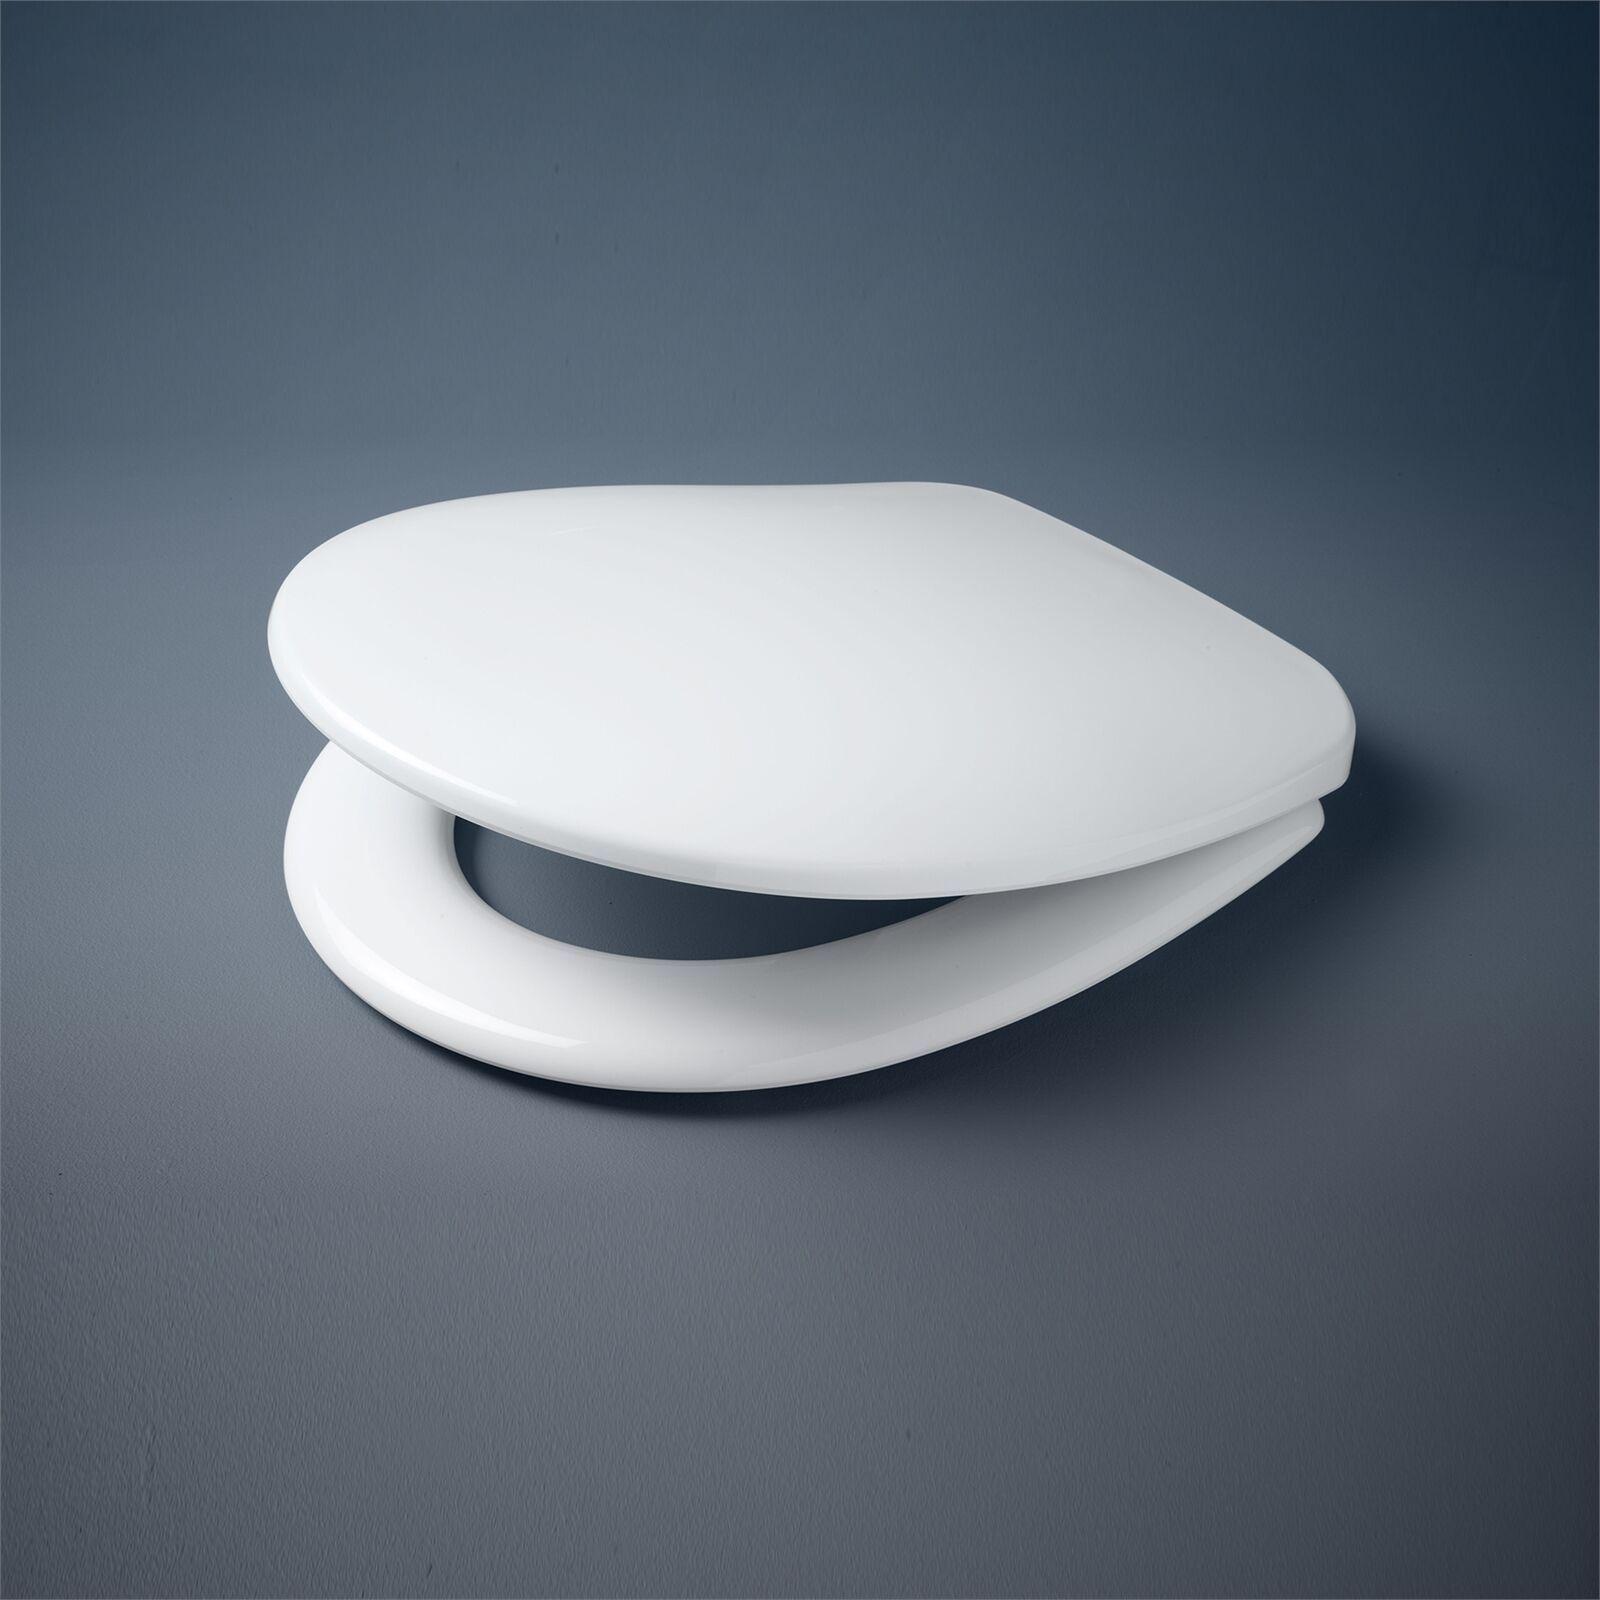 Caroma Hinge Profile Toilet Seat Soft Close Adjustable Fixing White Aust Brand In 2020 Caroma Toilet Seat Gold Taps